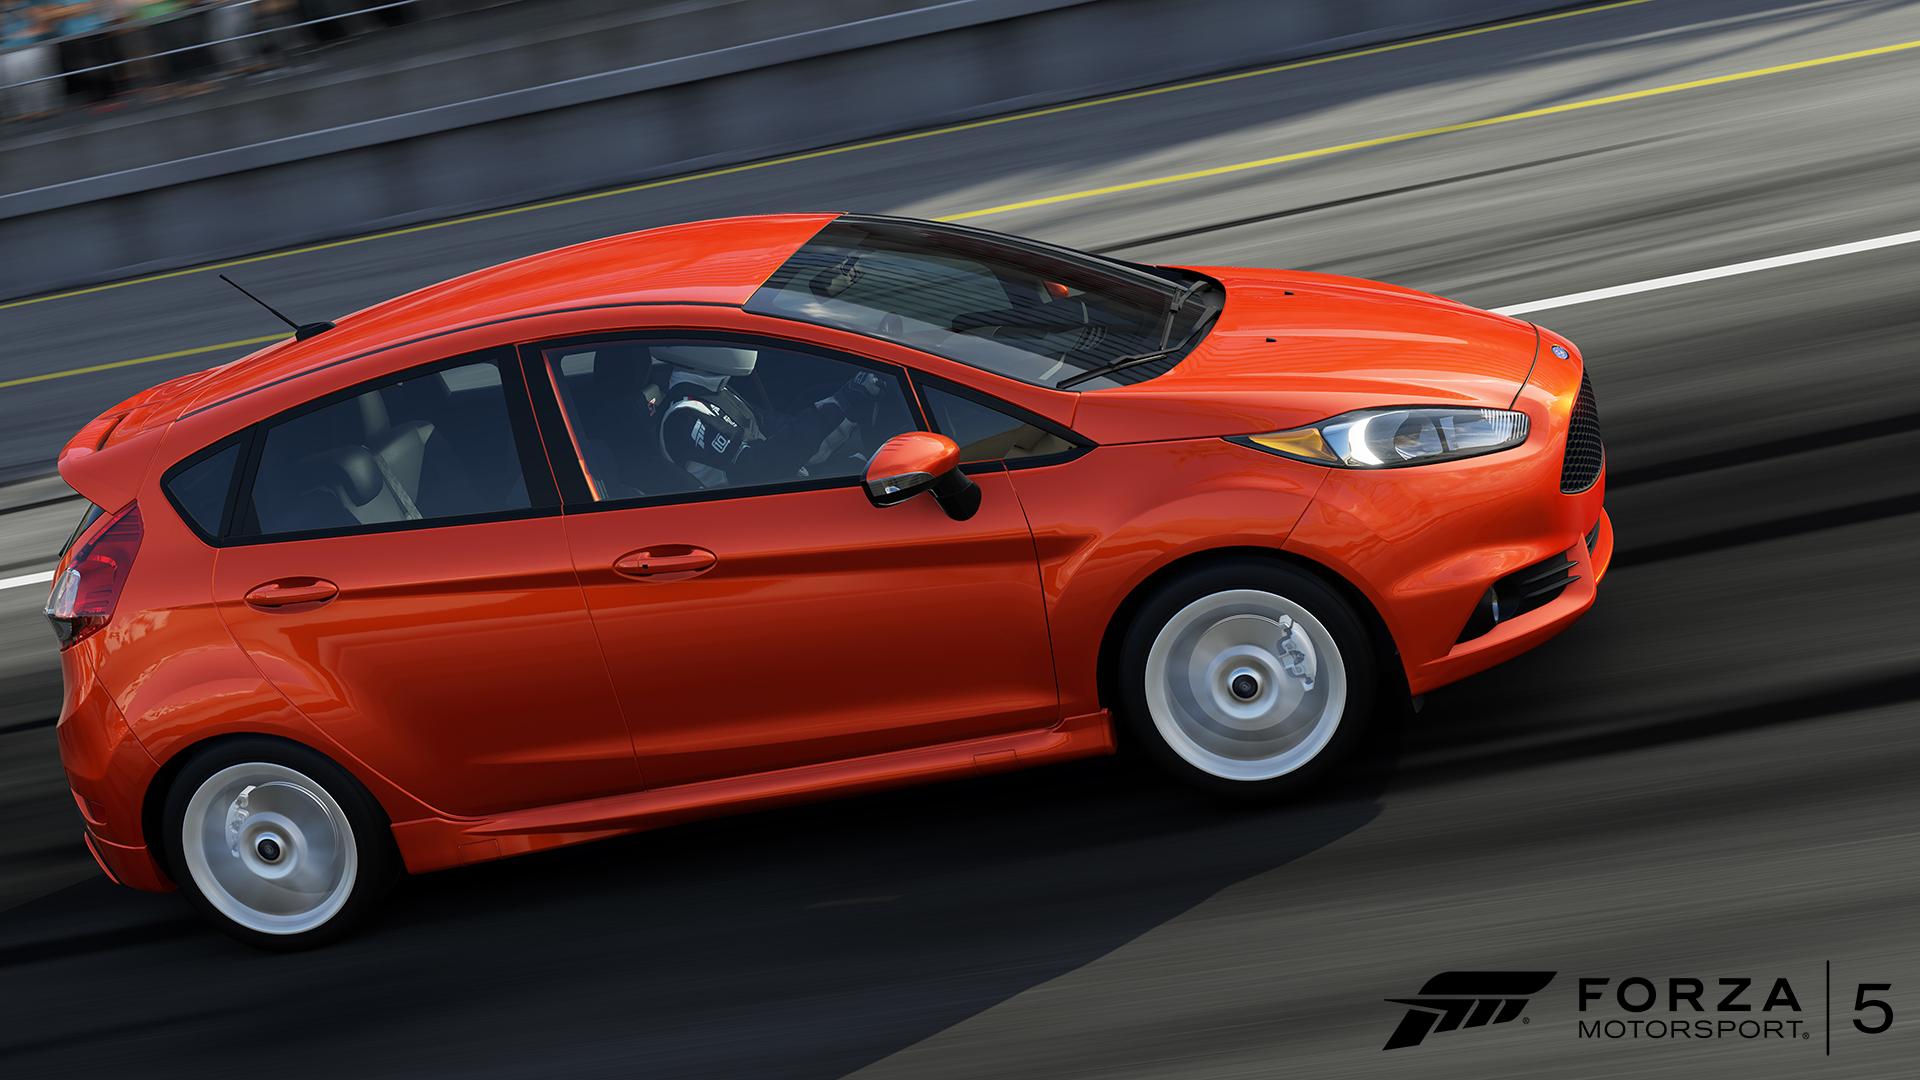 Ford Fiesta Fuse Box Layout Image Fm5 St Forza Motorsport Wiki Fandom